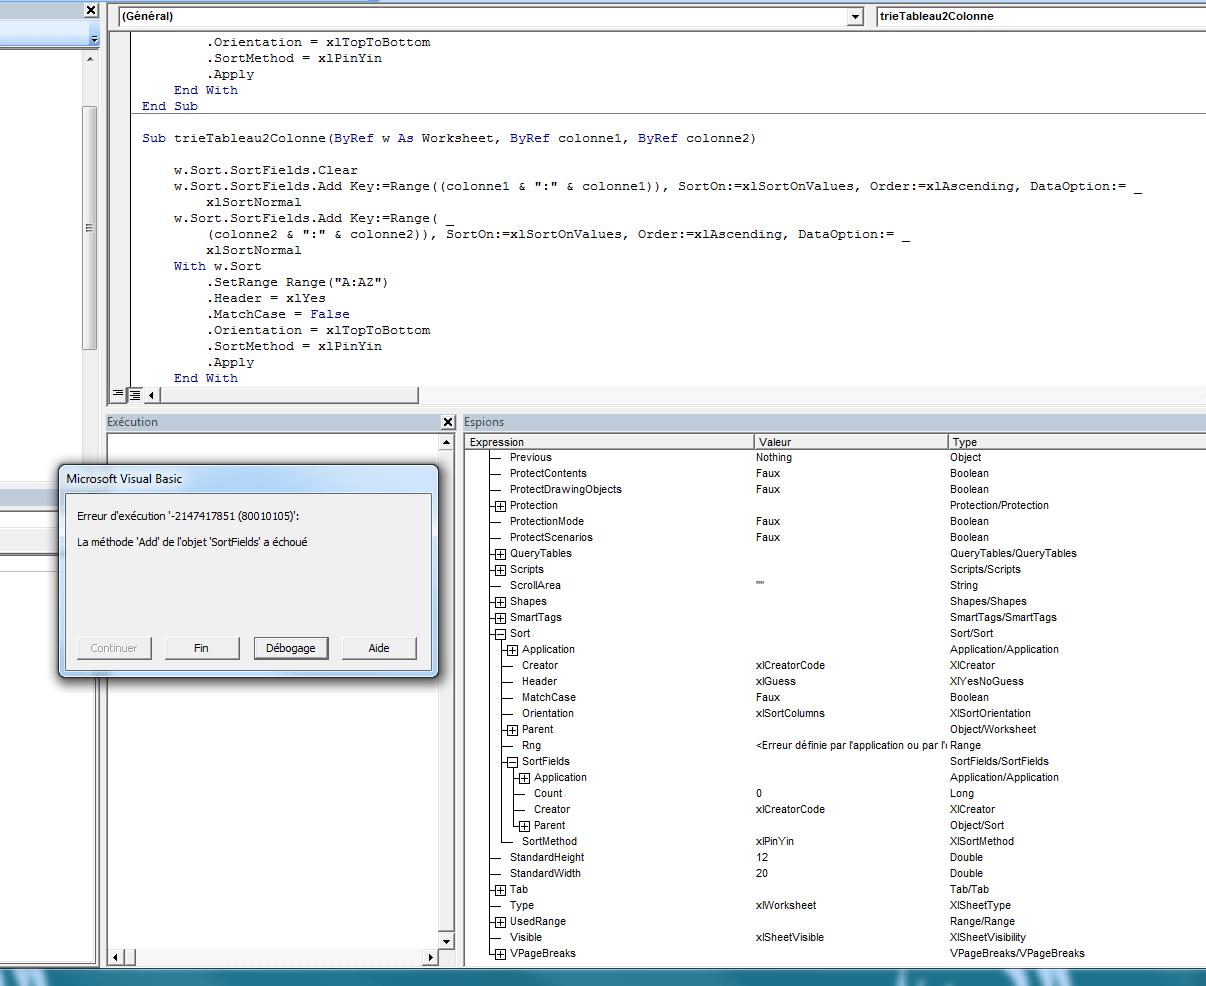 Vba Reference To Worksheet